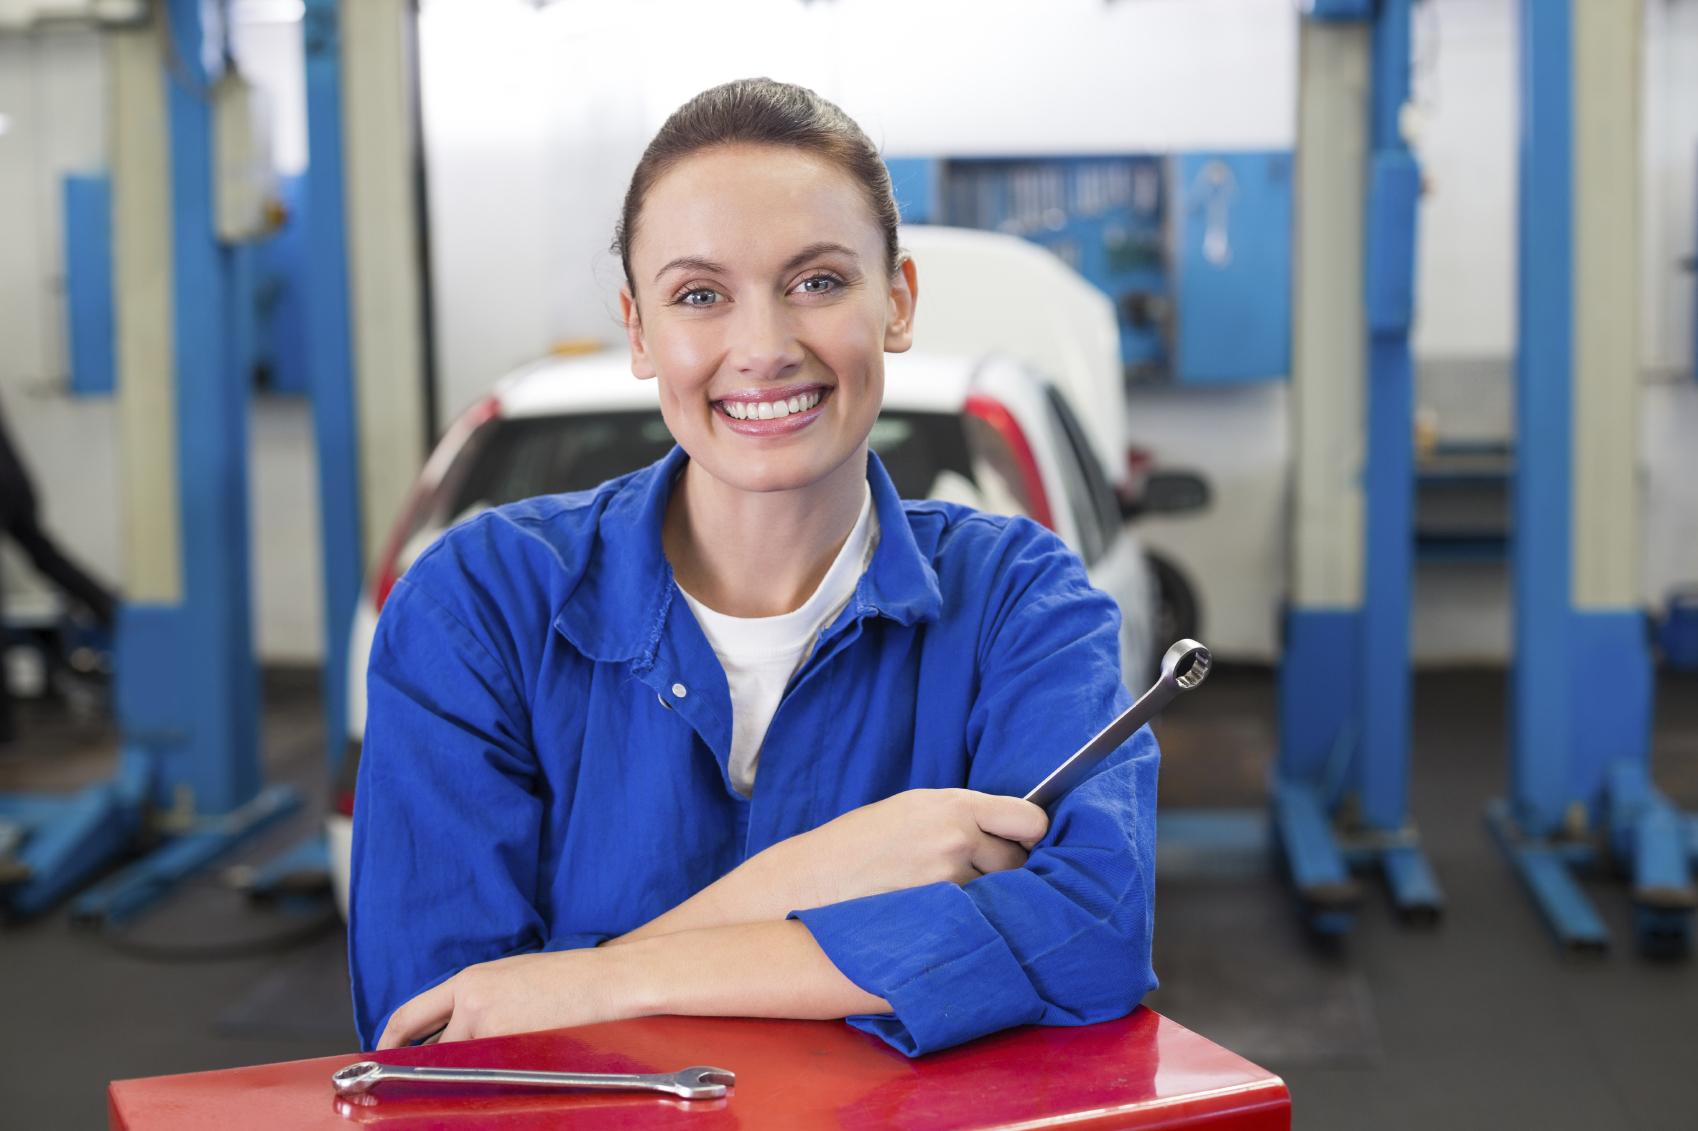 Acura Auto Repair Service near Washington, DC